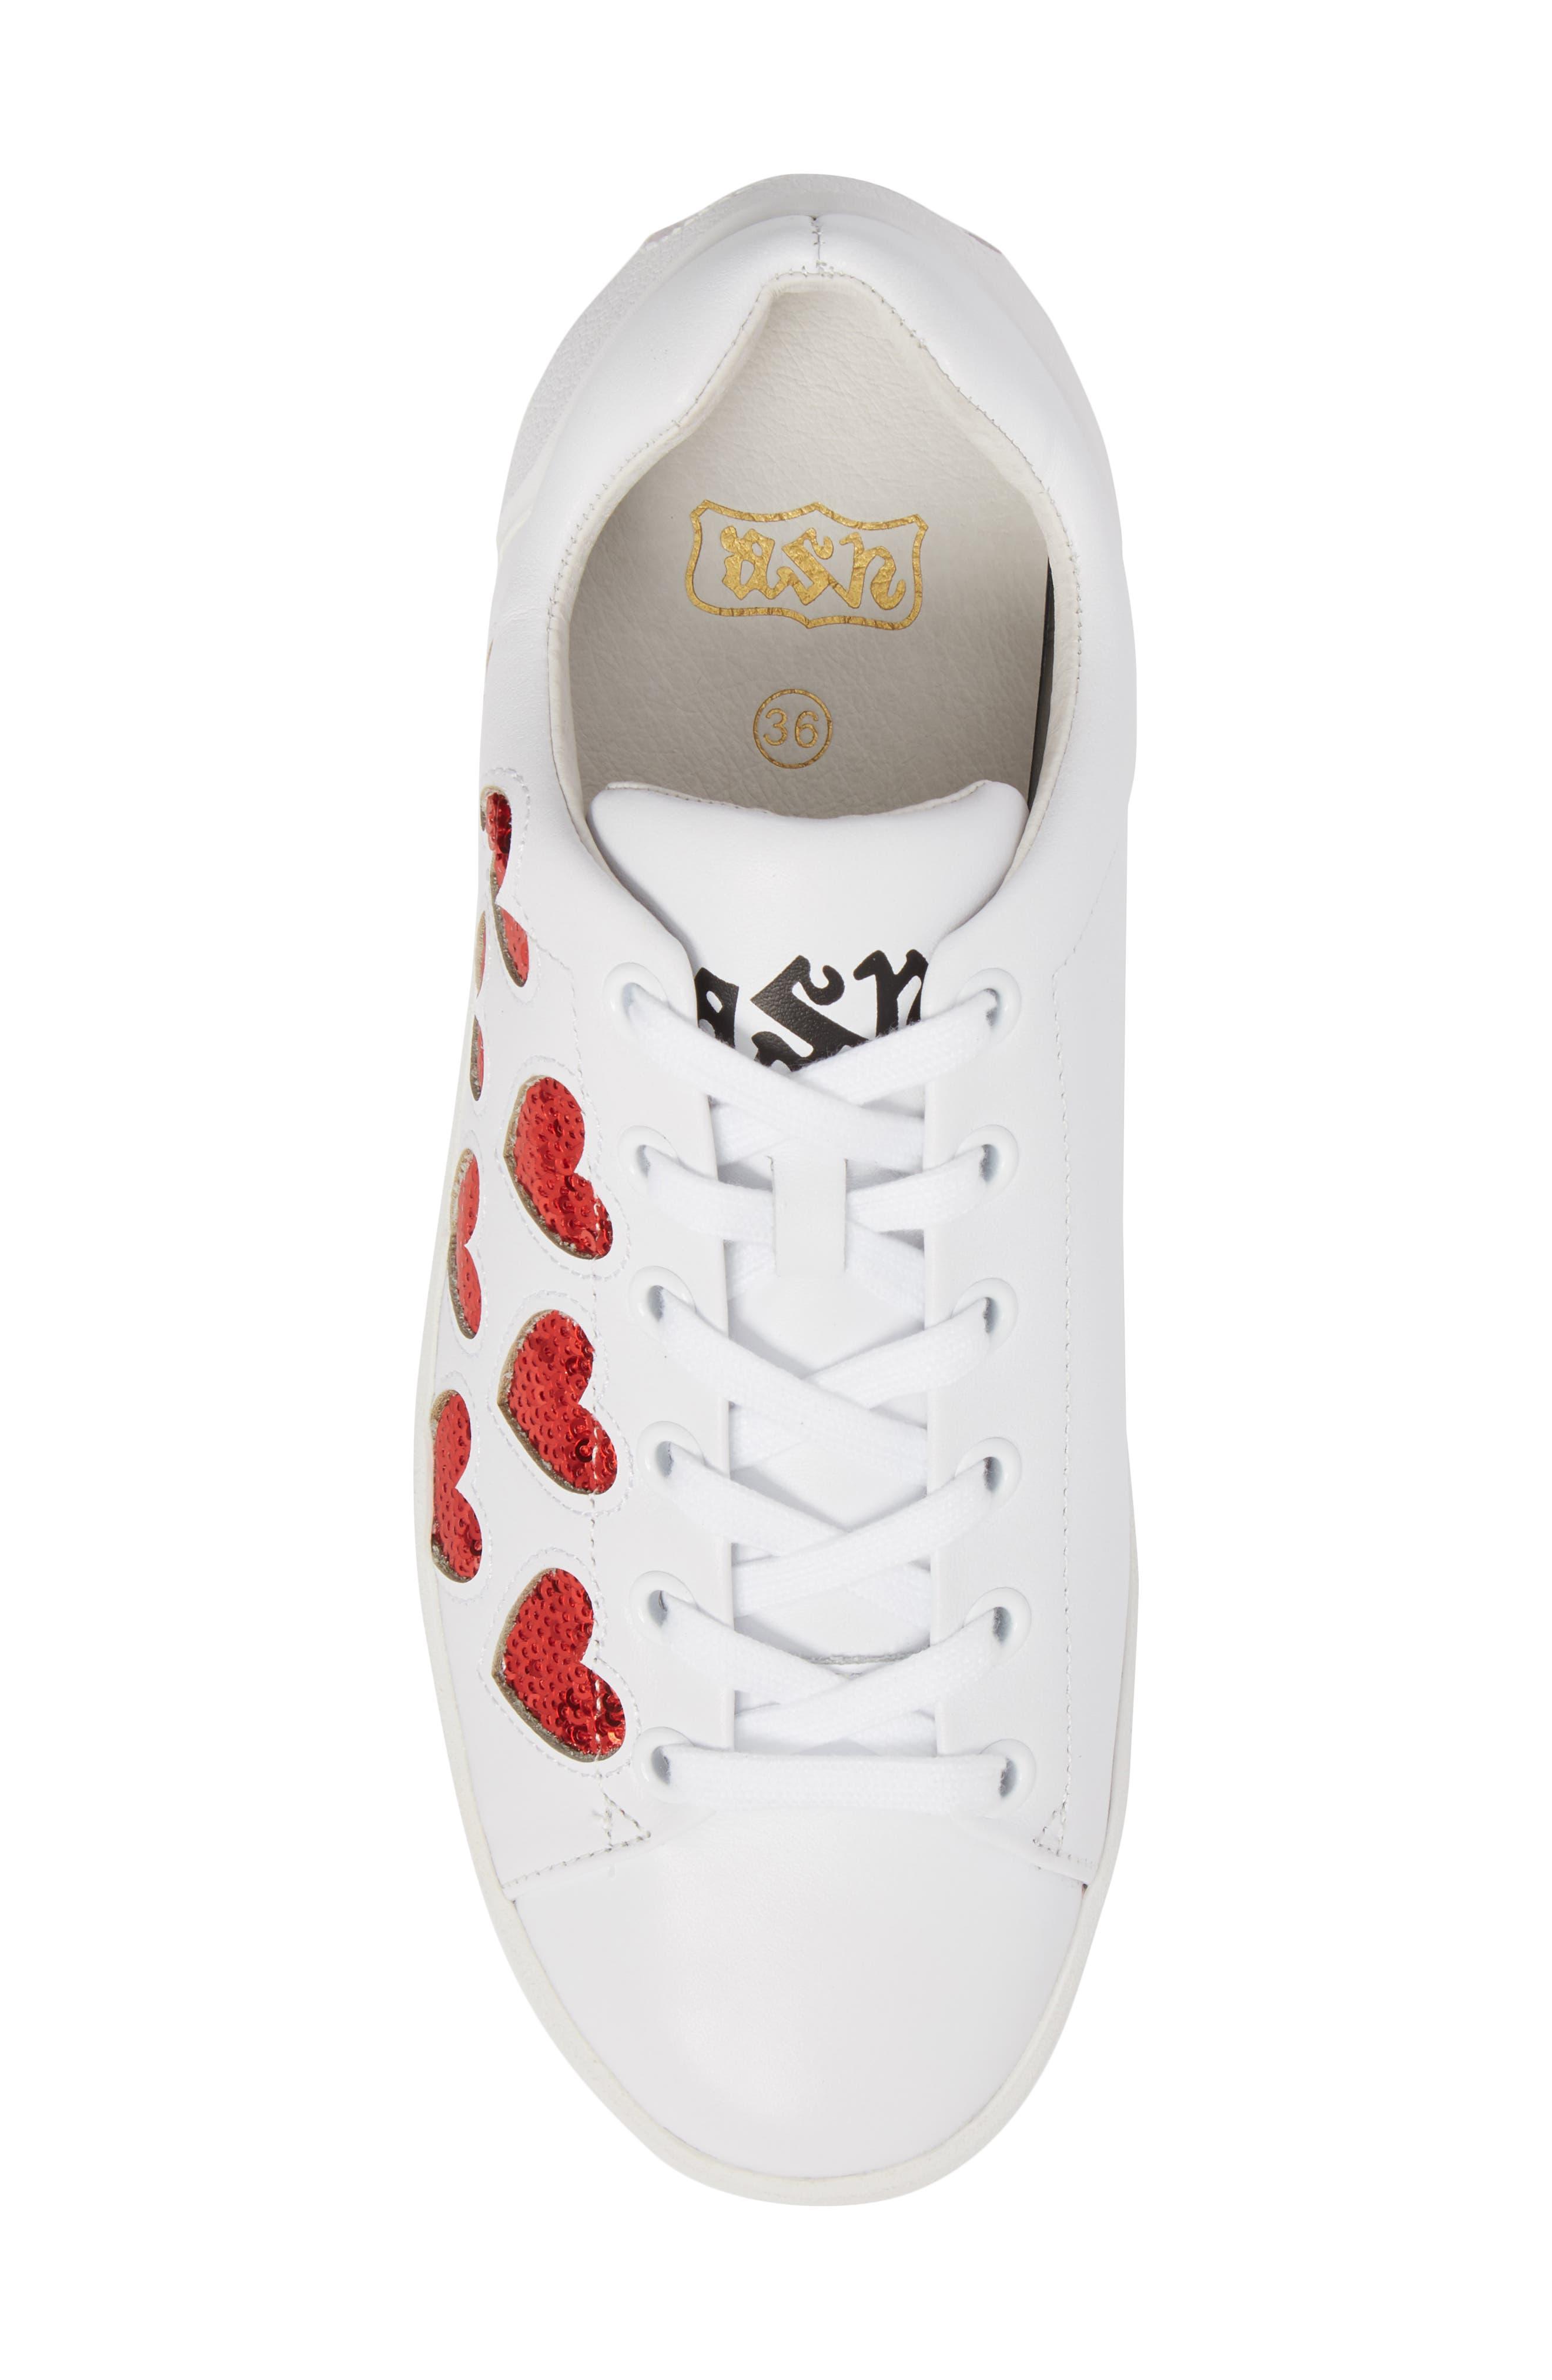 Nikita Sneaker,                             Alternate thumbnail 5, color,                             White/ Red